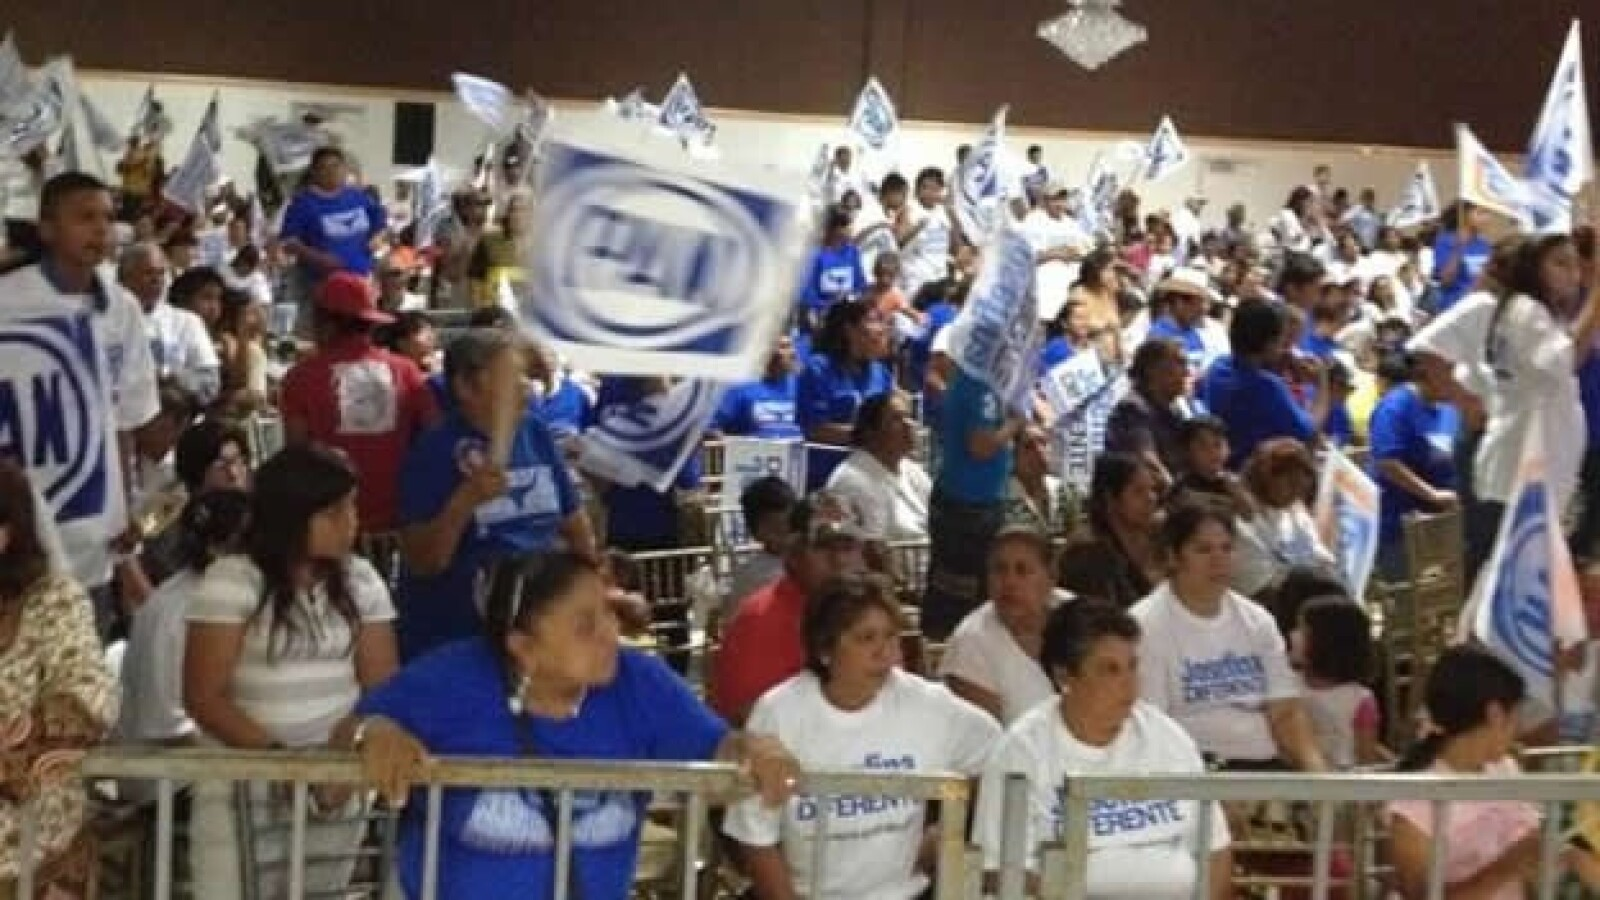 Mujeres apoyan a vazquez mota en tamaulipas